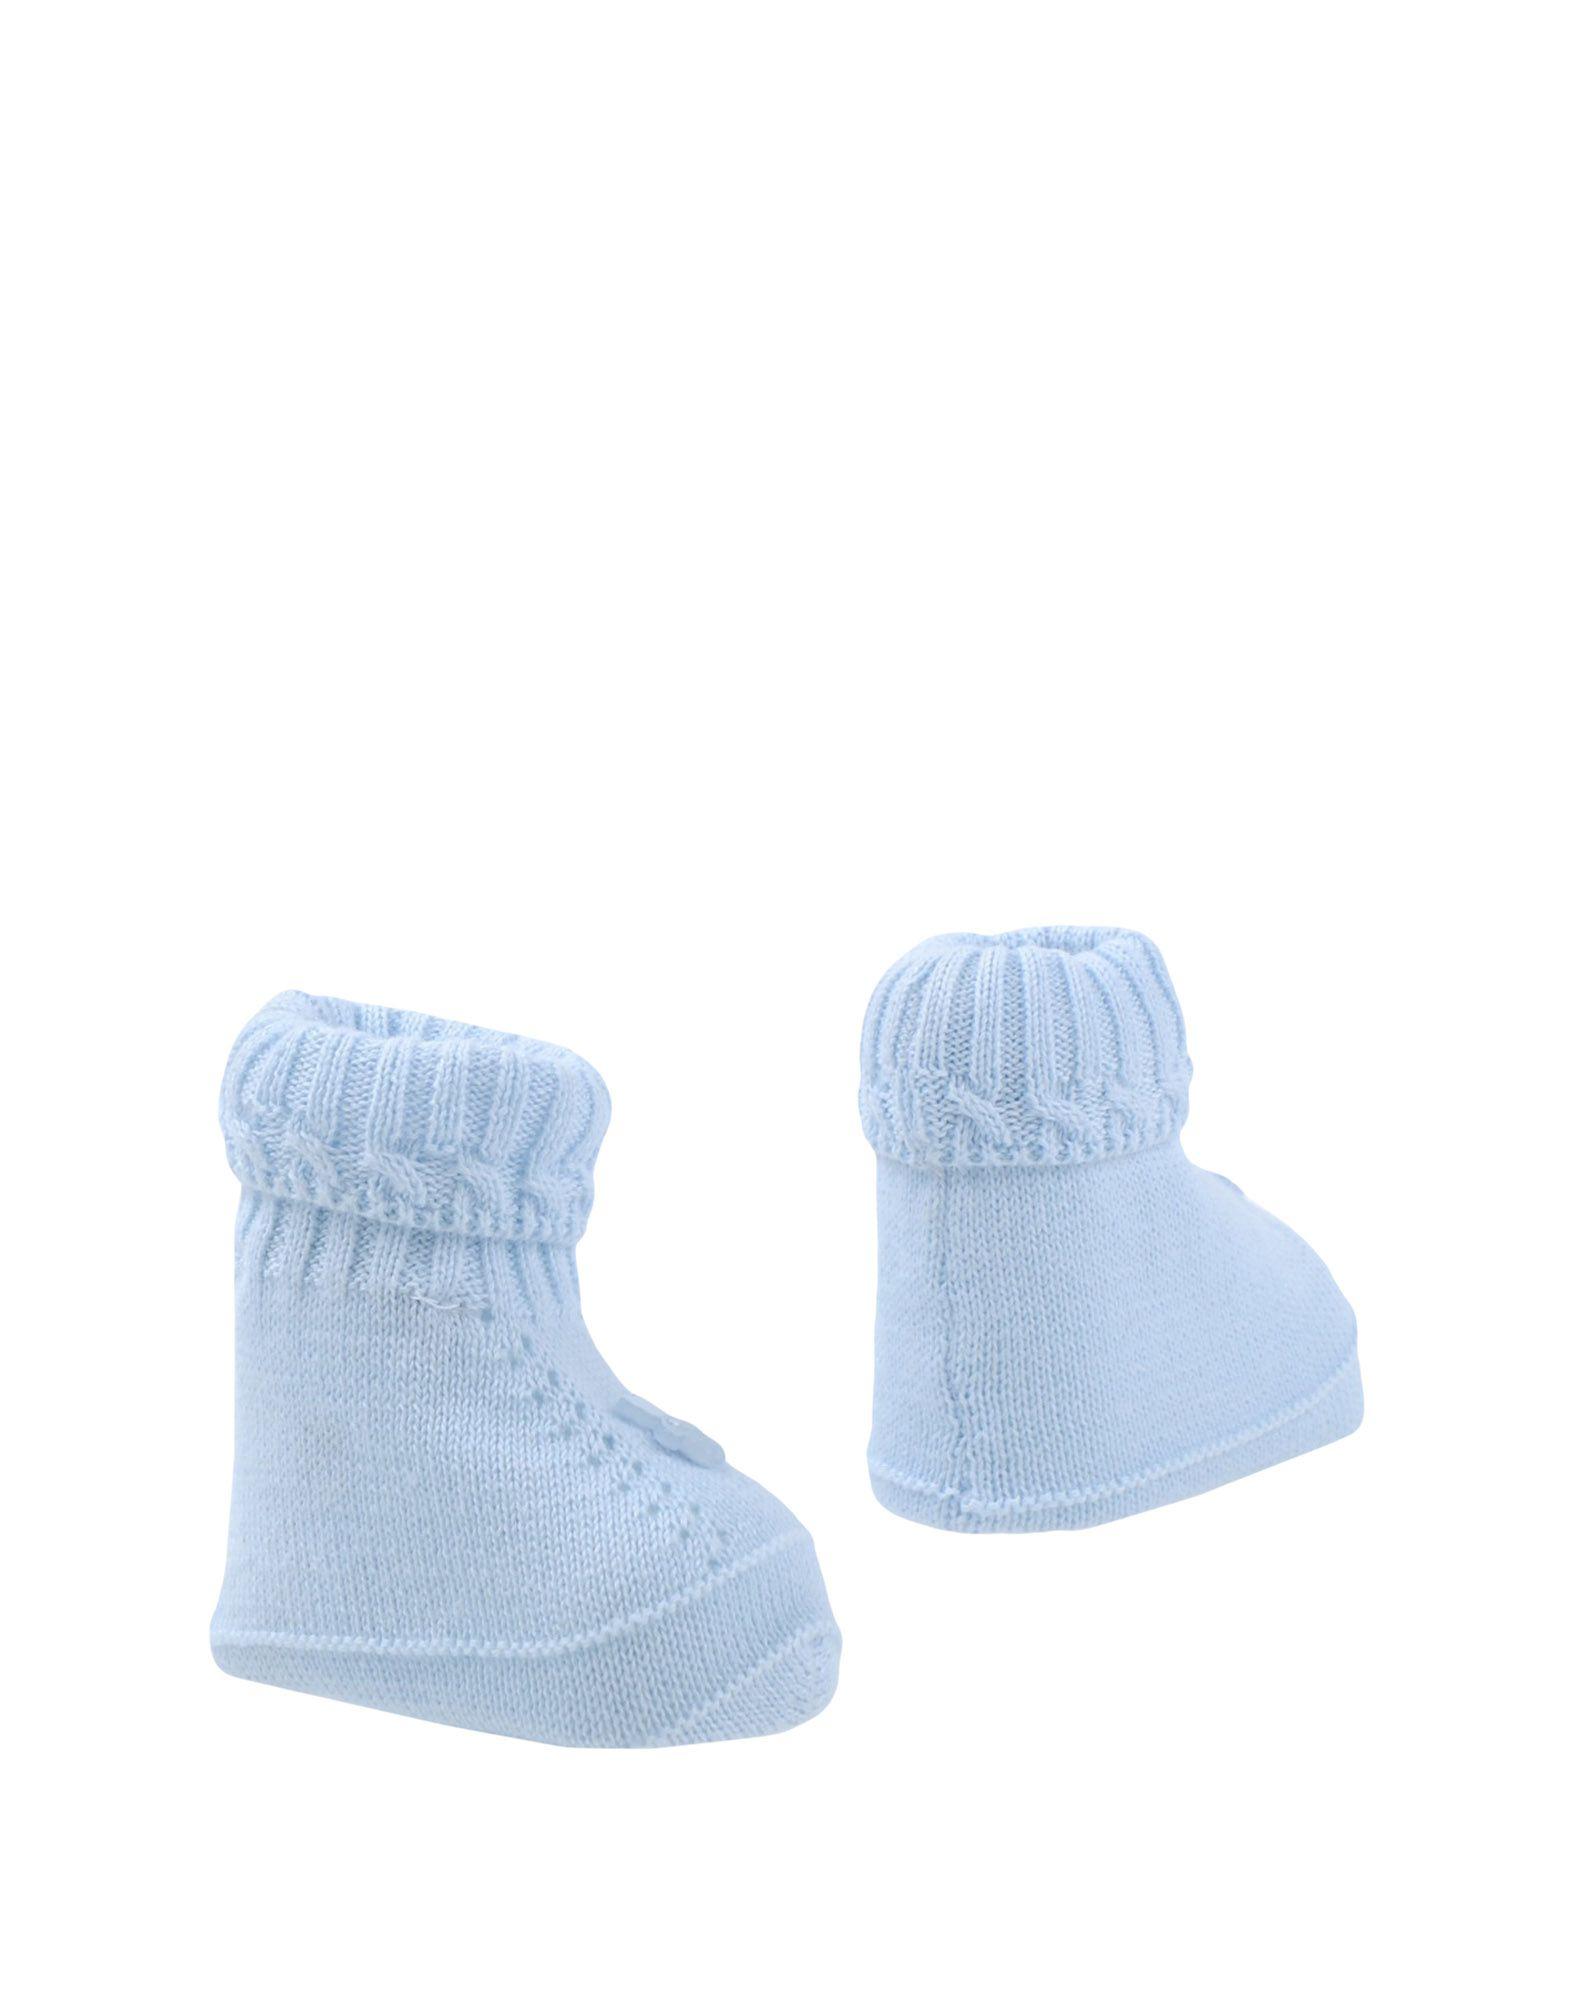 Rabatt echte Schuhe Nanán Schuhe Für Neugeborene Herren  11324827OO